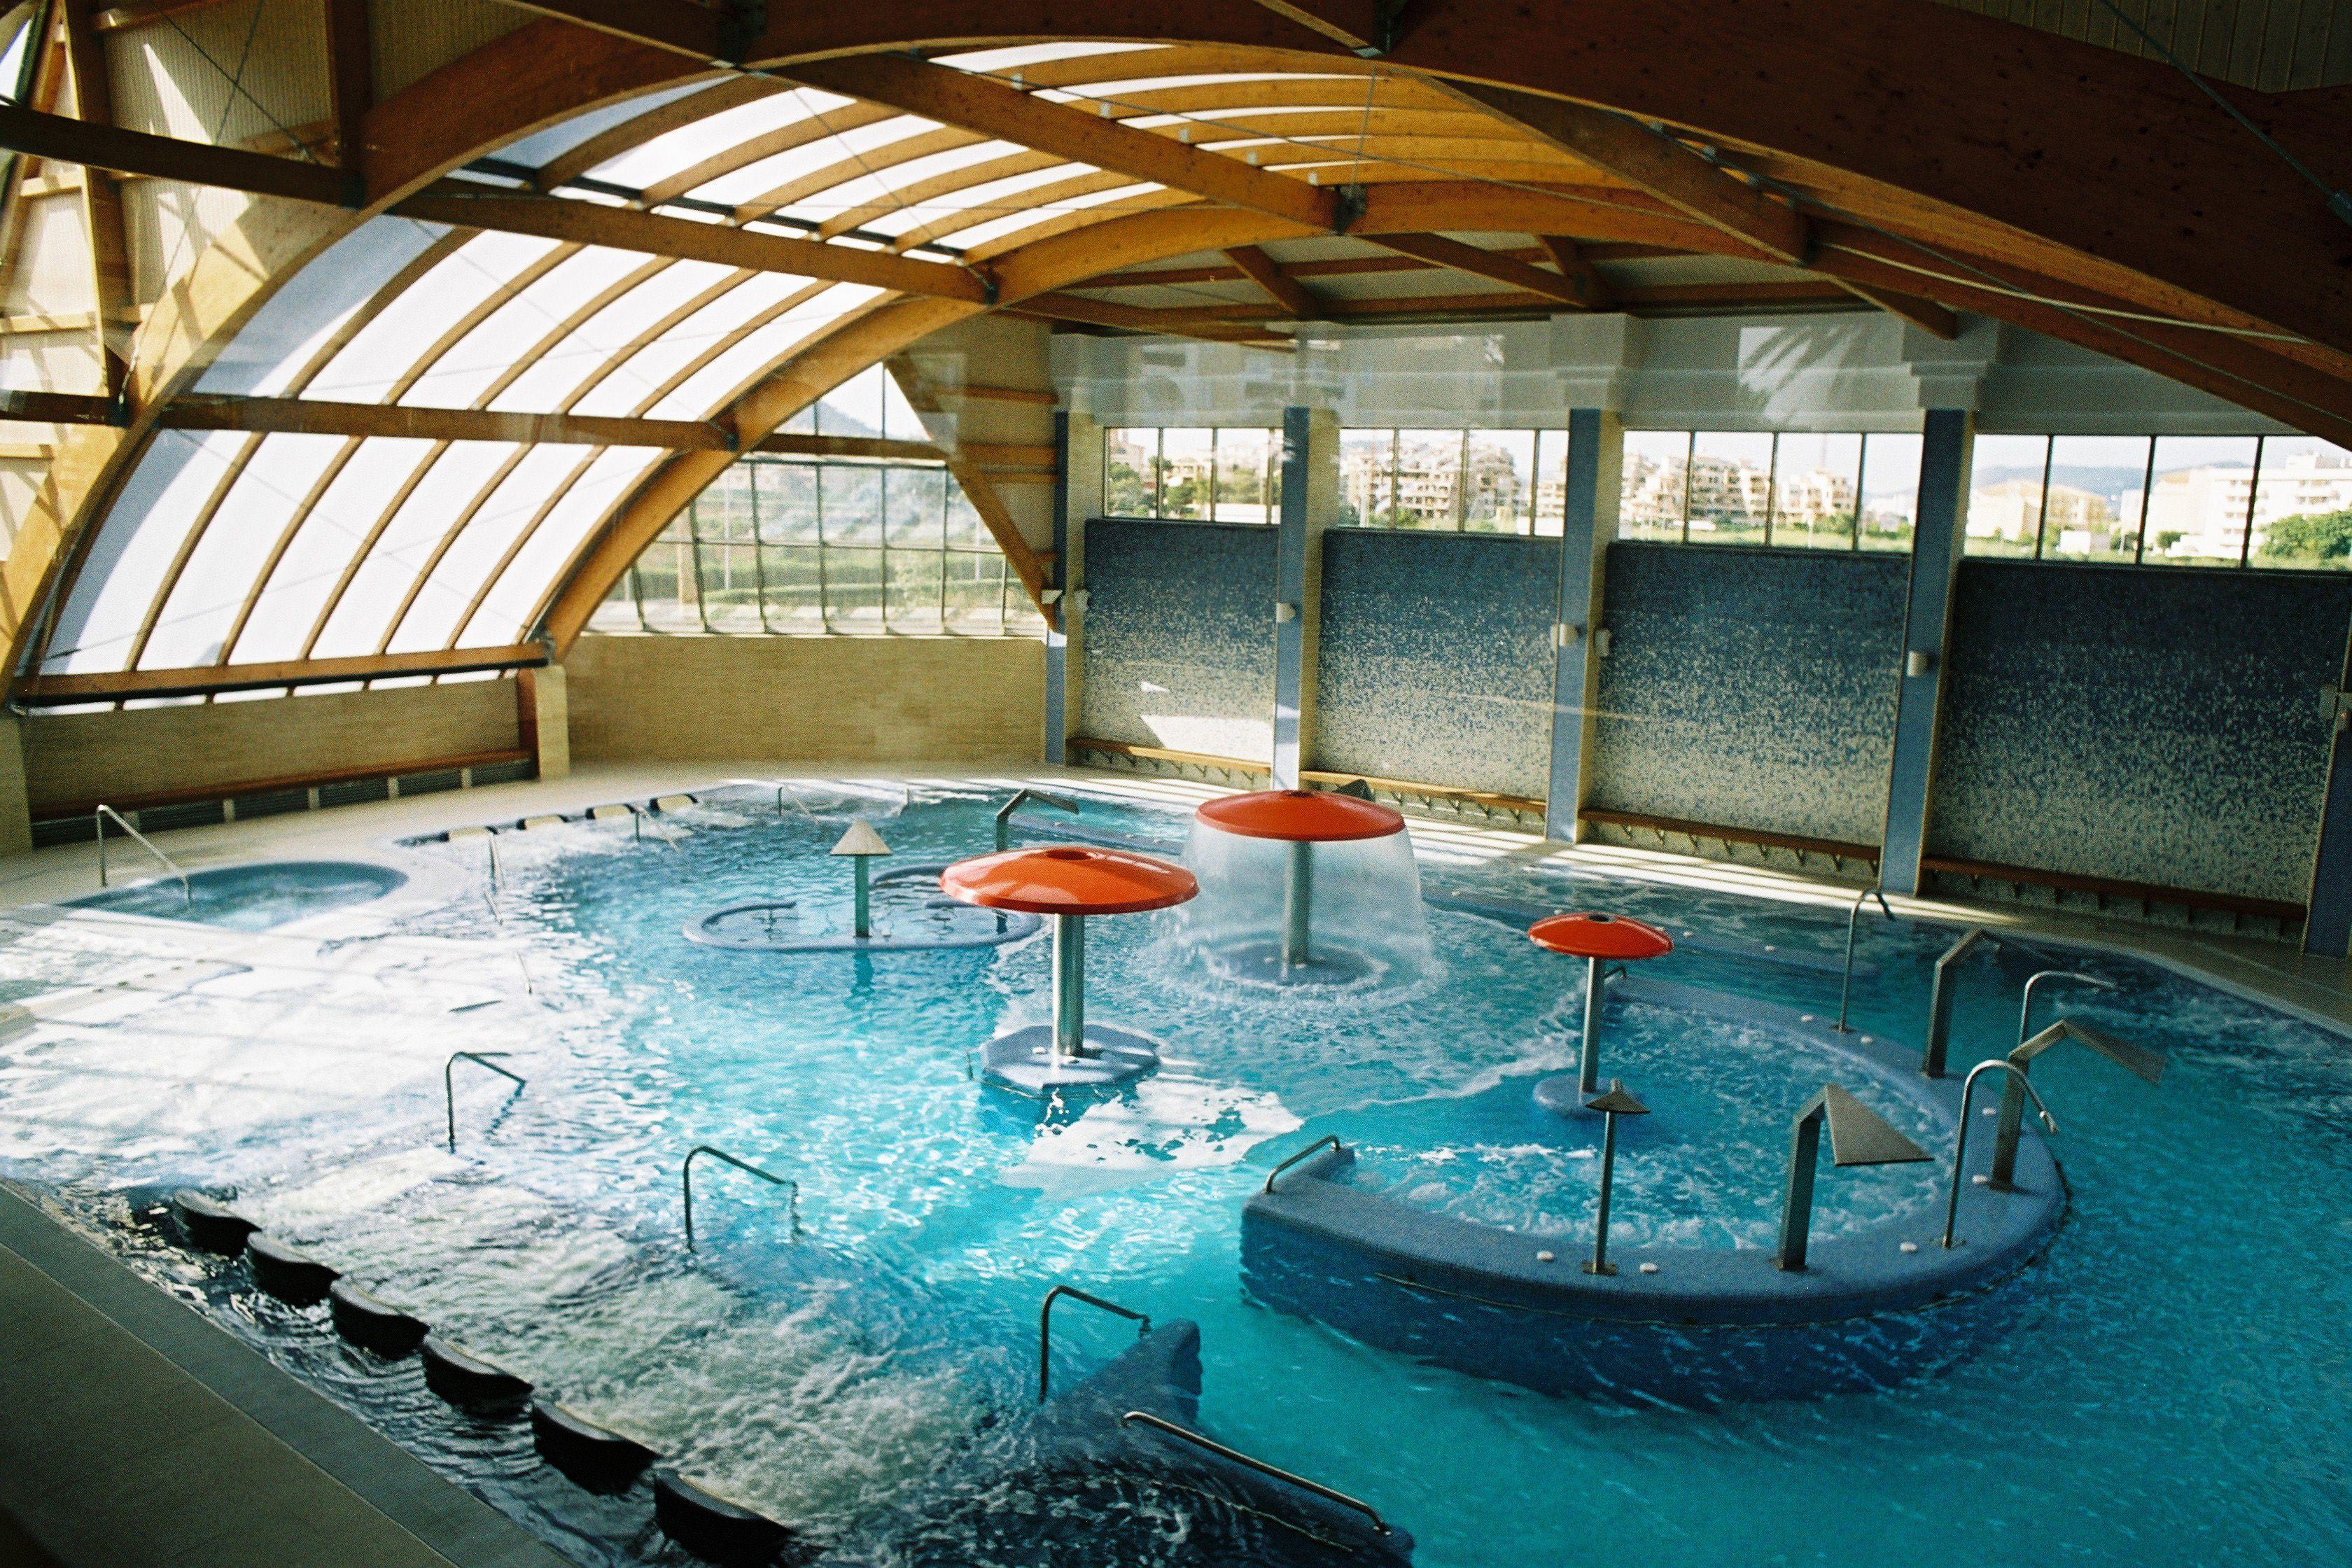 Circuito Hidrotermal : Circuito hidrotermal biomar spa biomar spa spa